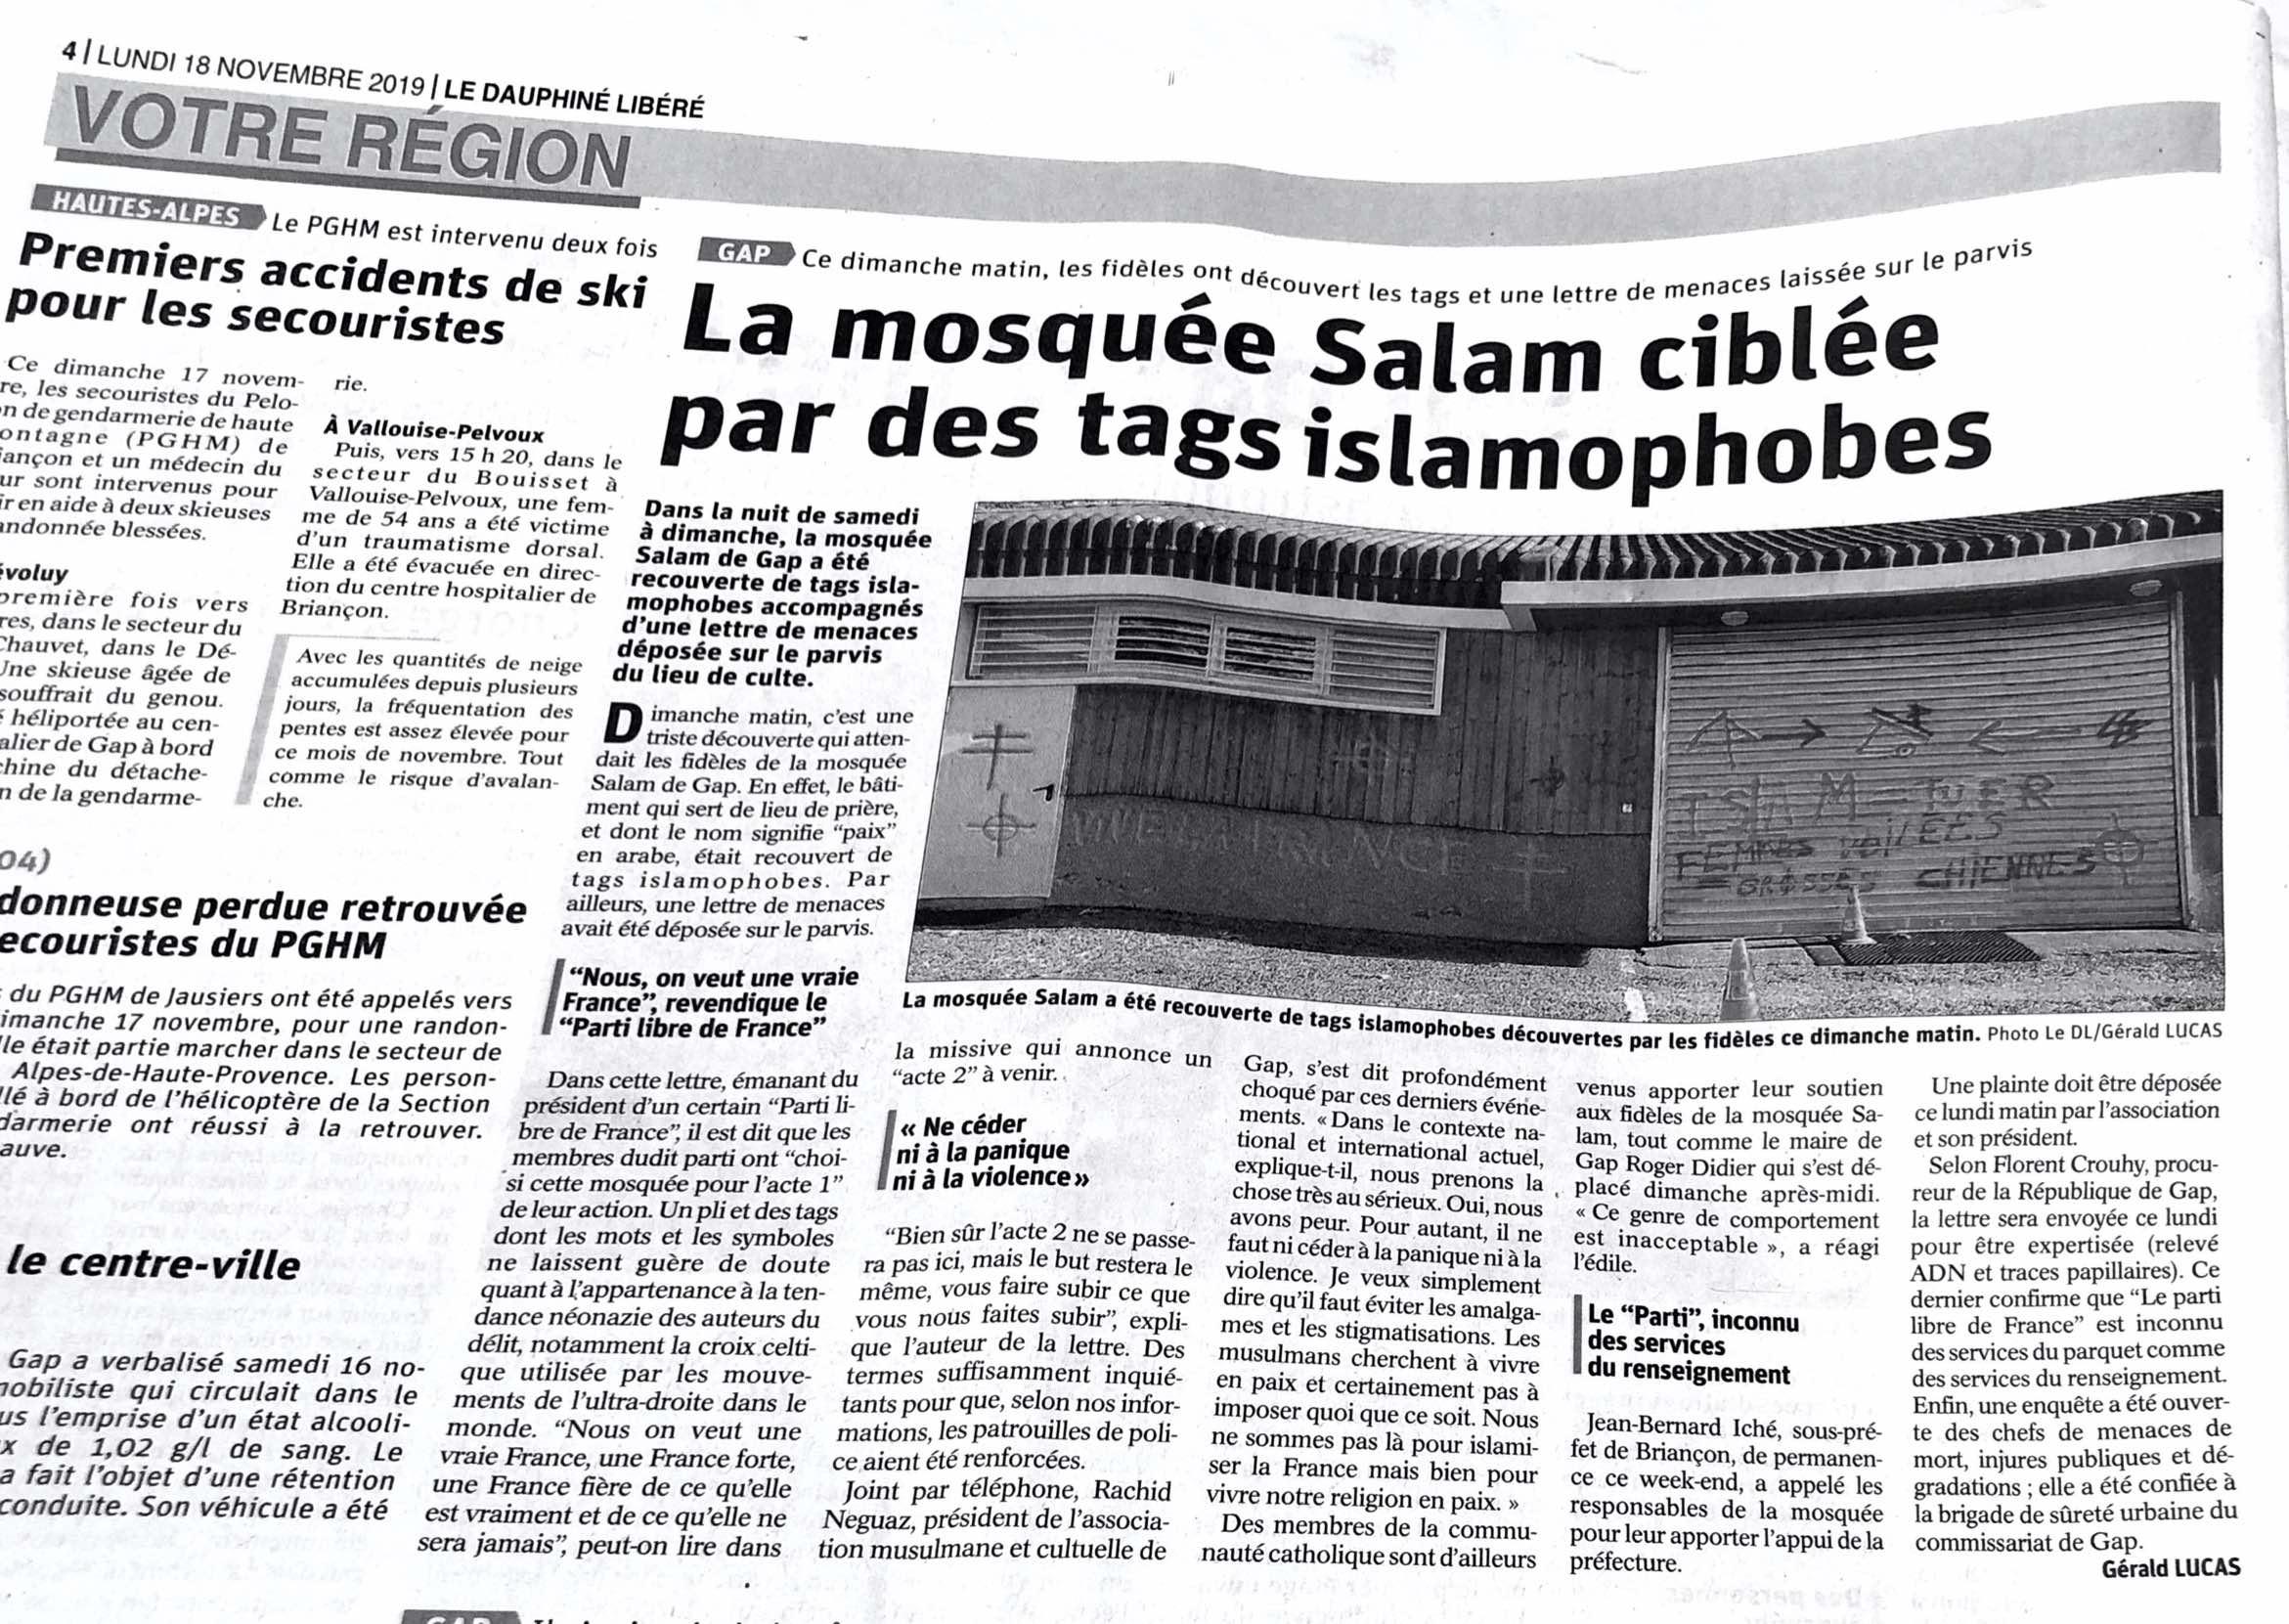 La mosquée Salam ciblée par des tags islamophobes